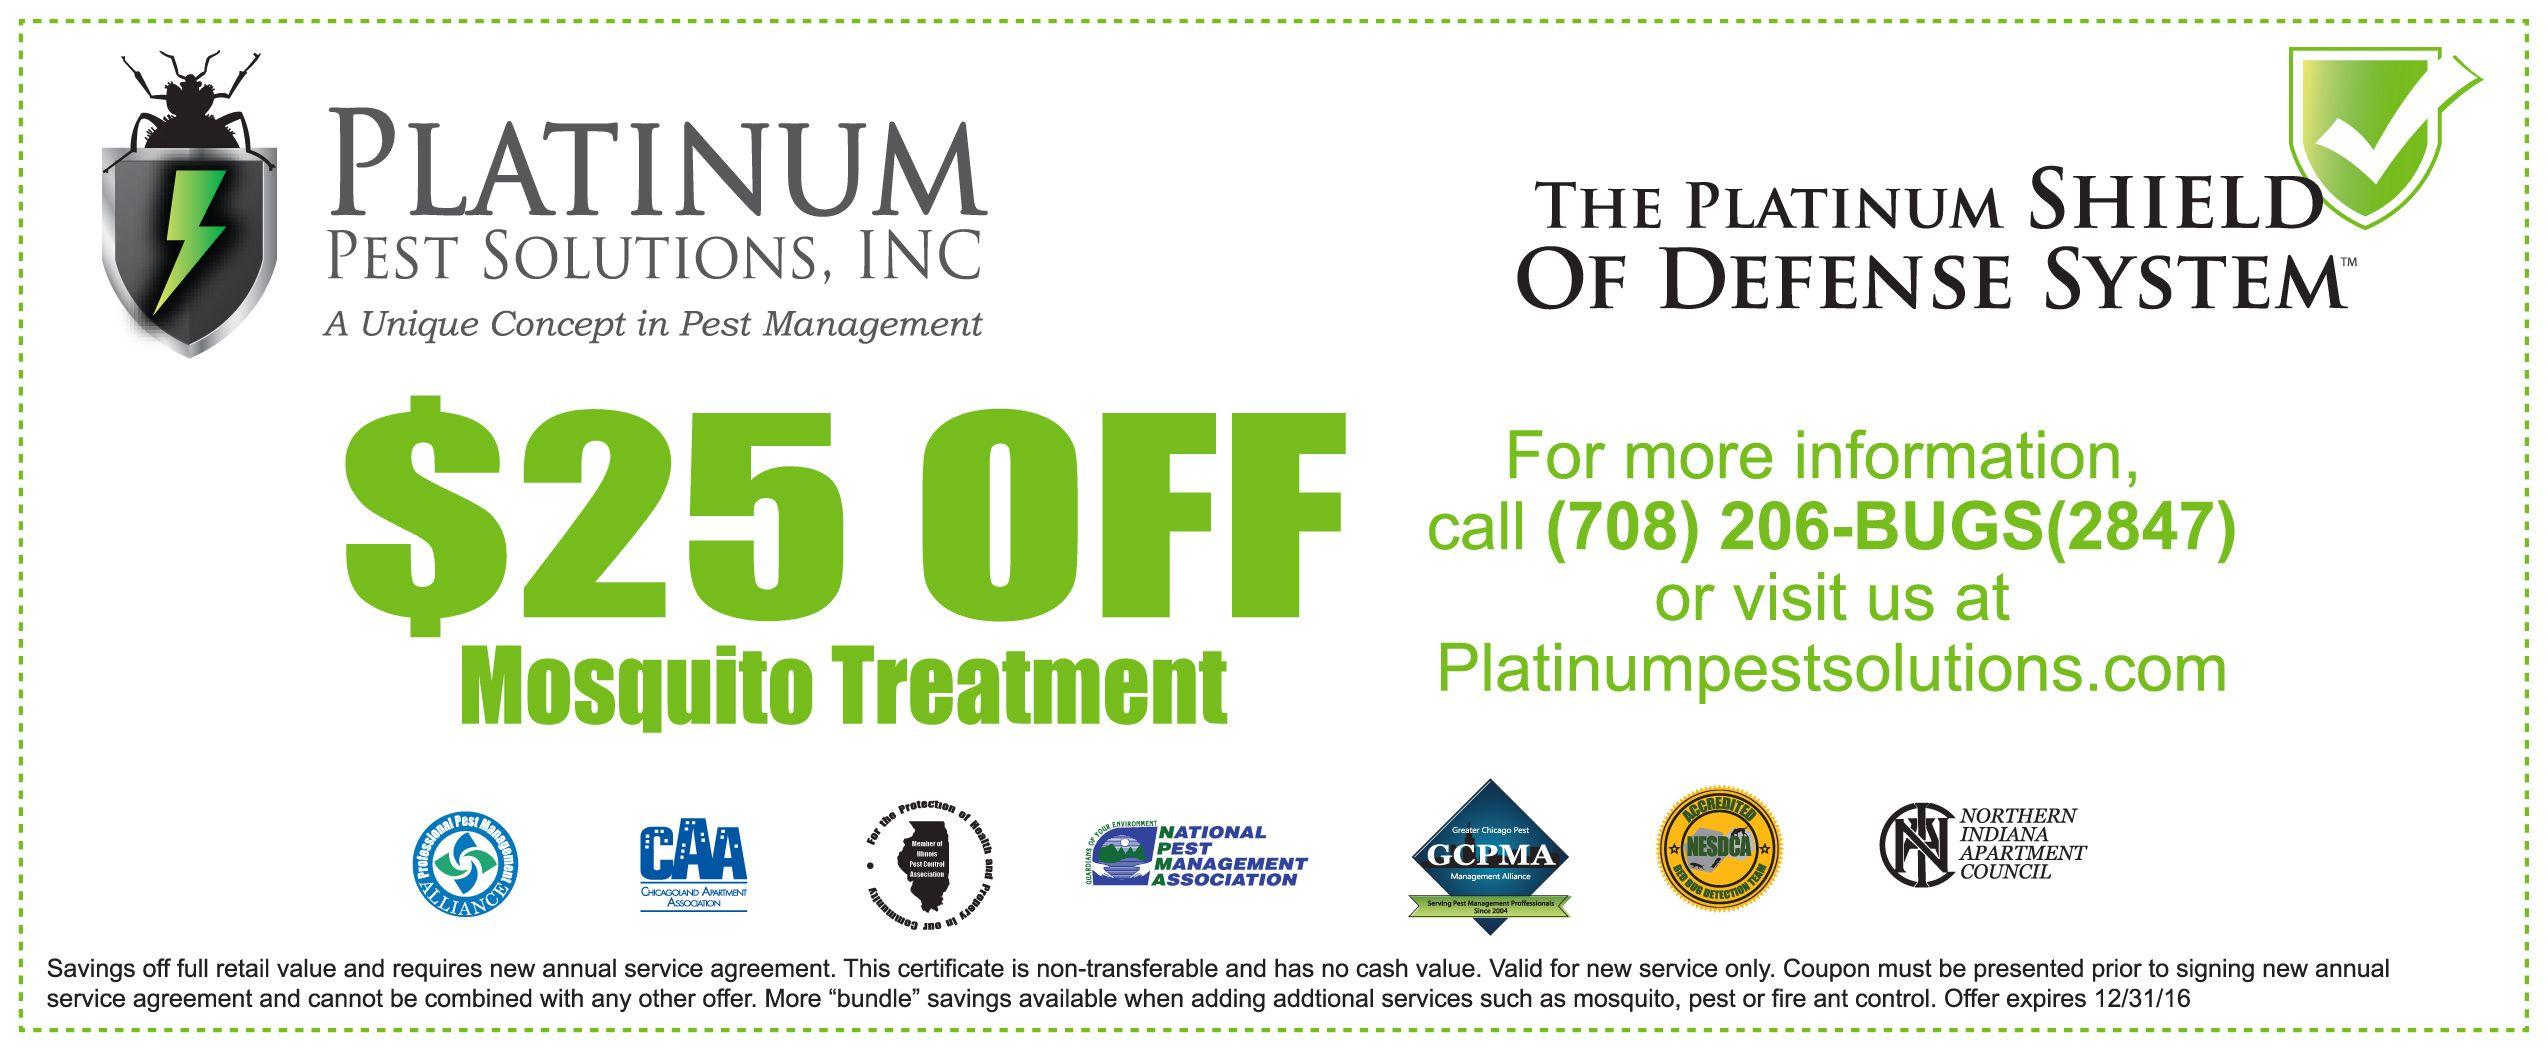 Platinum Pest Solutions Inc Review Pest Control Services In Lansing Il Pest Solutions Best Mosquito Repellent Mosquito Repellent